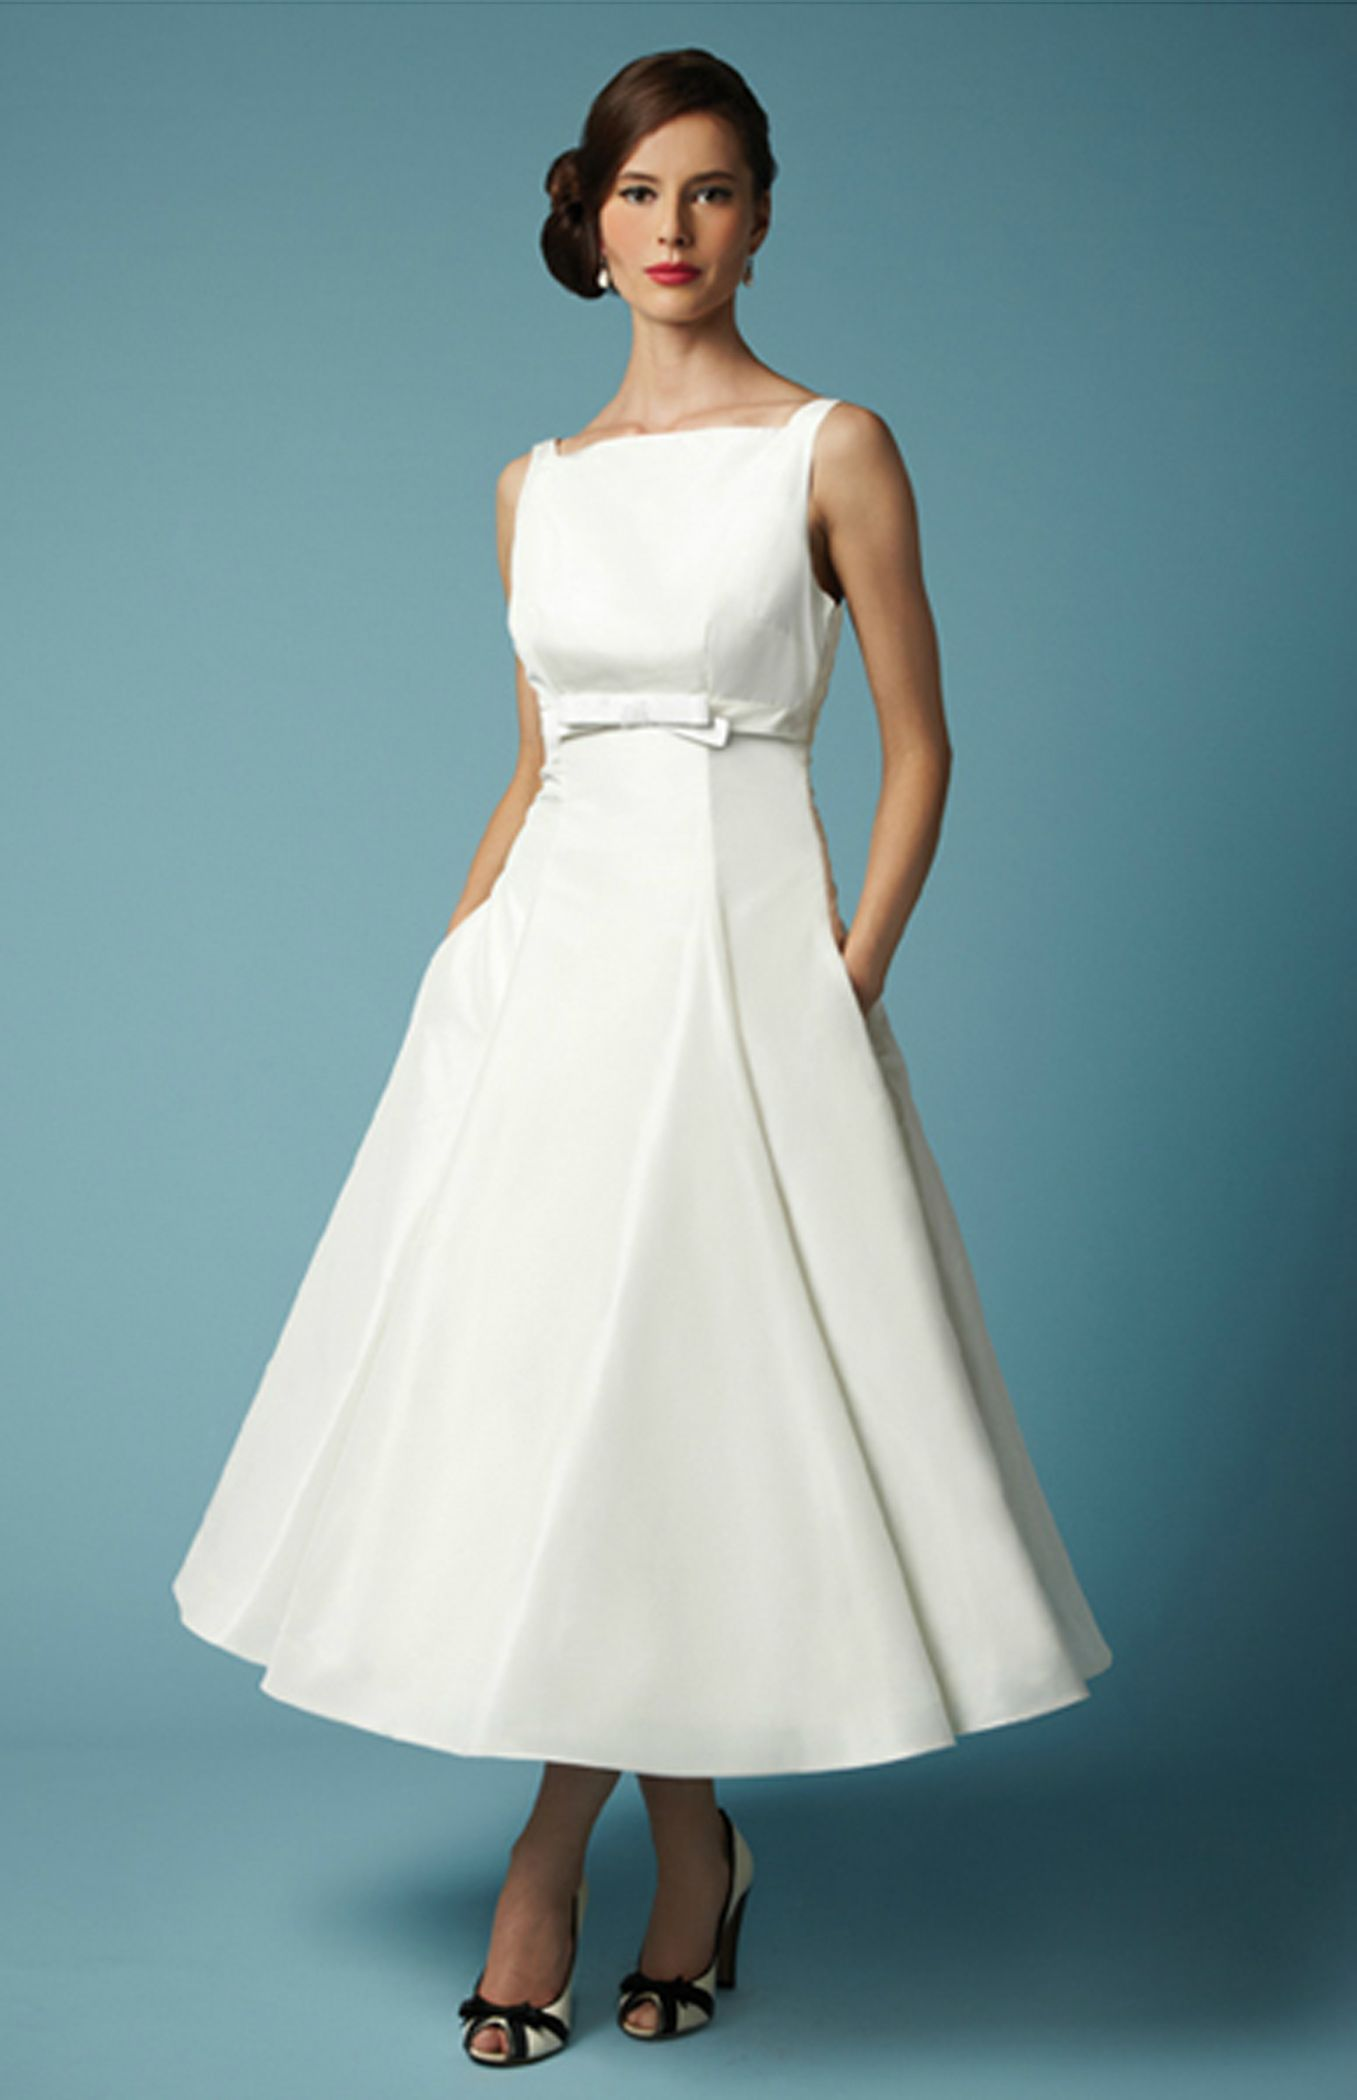 Empire line fashion pinterest fancy wedding dress and fashion